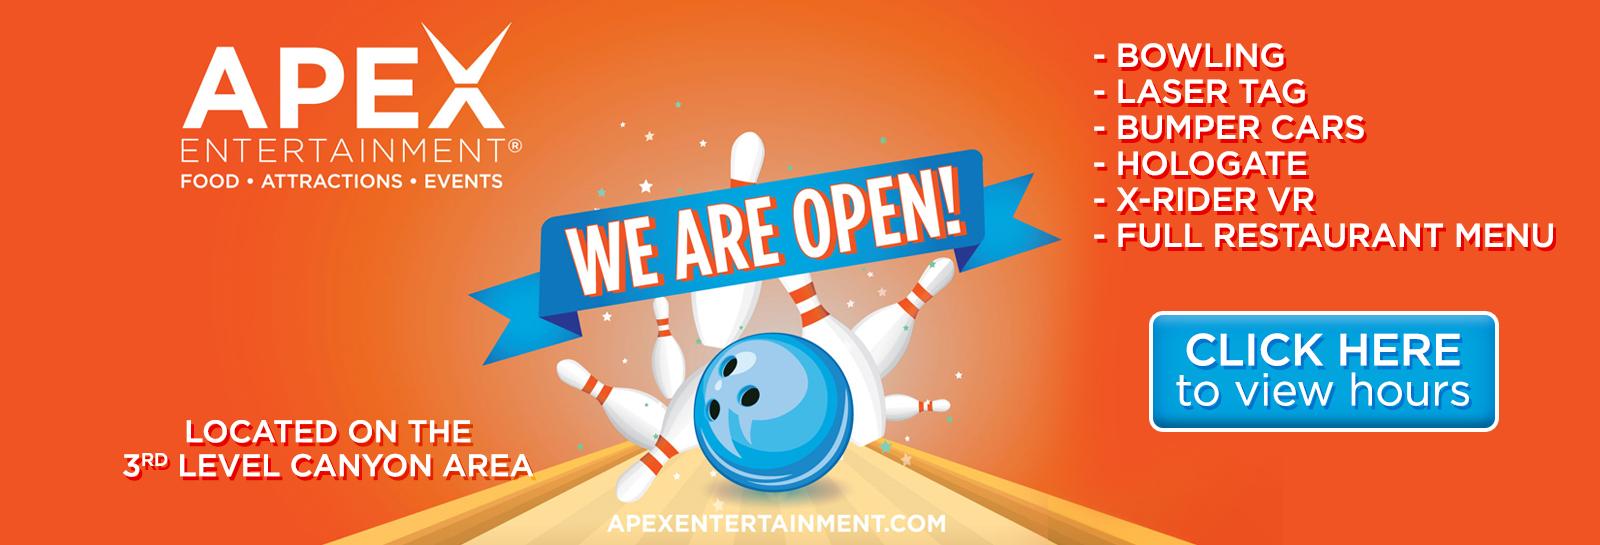 2020 10 06 APEX now open slider